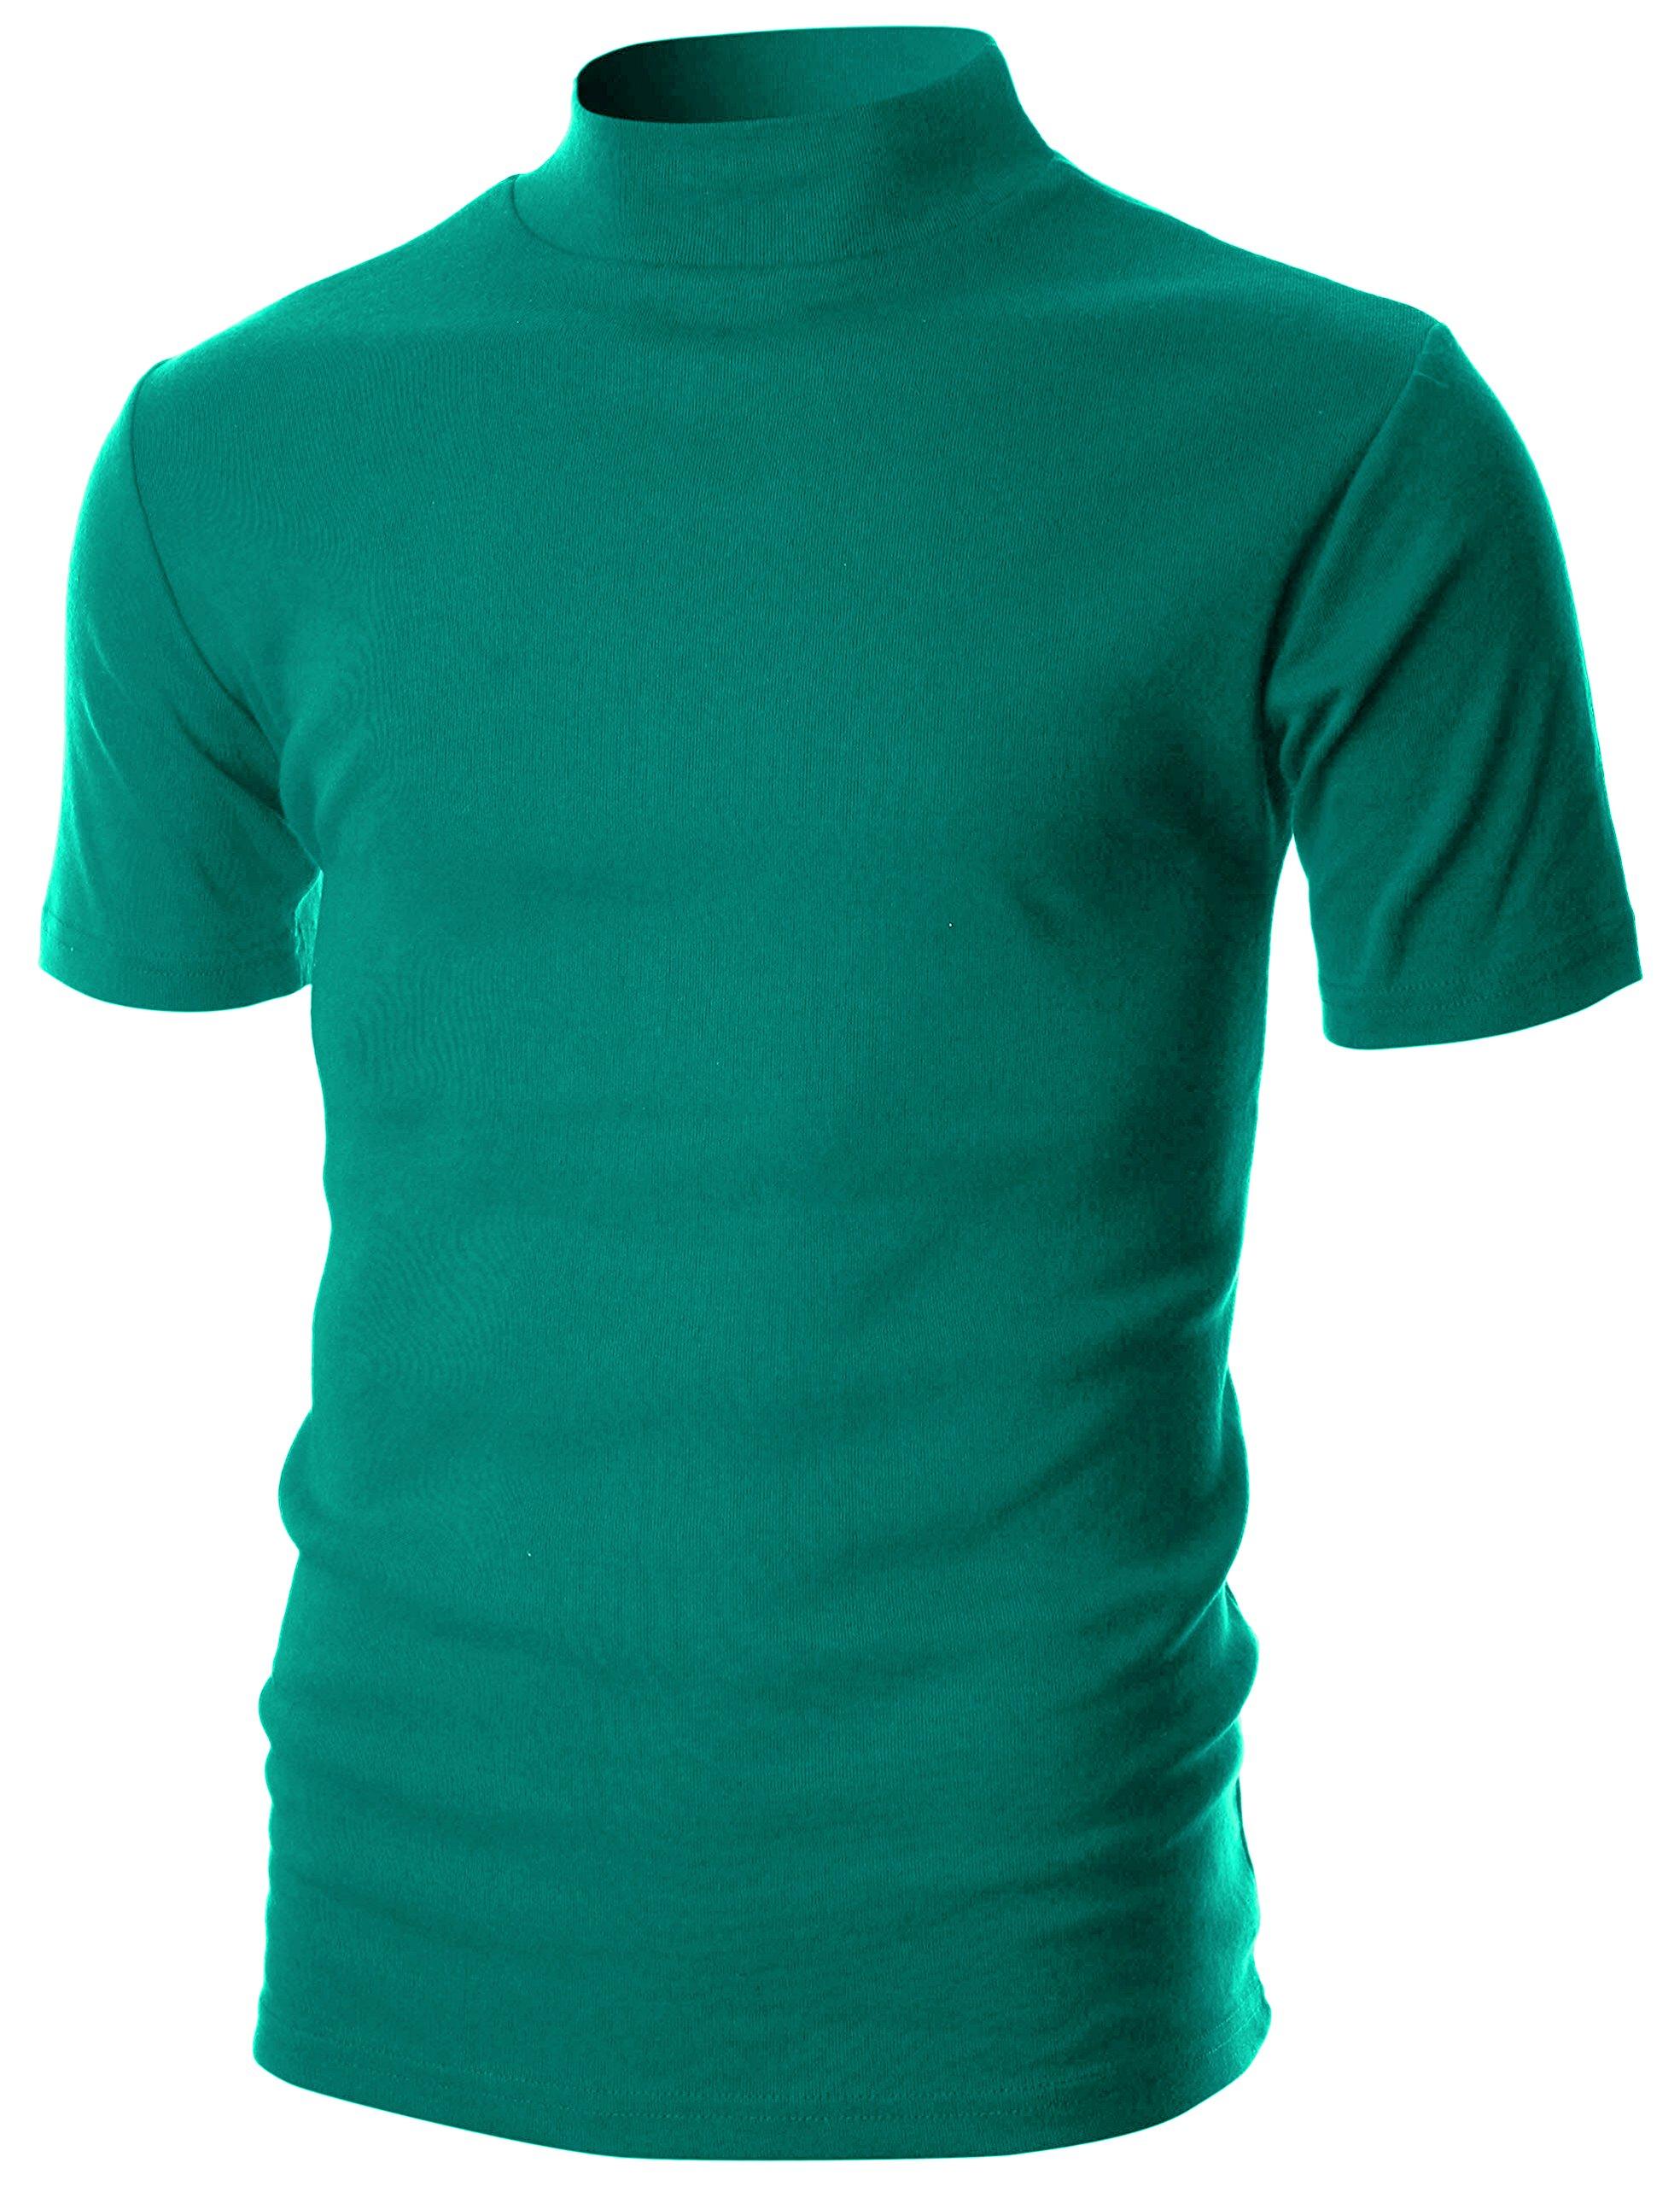 Ohoo Mens Slim Fit Flice Short Sleeve Pullover Lightweight Mockneck/DCT105-TURQUOISE-S